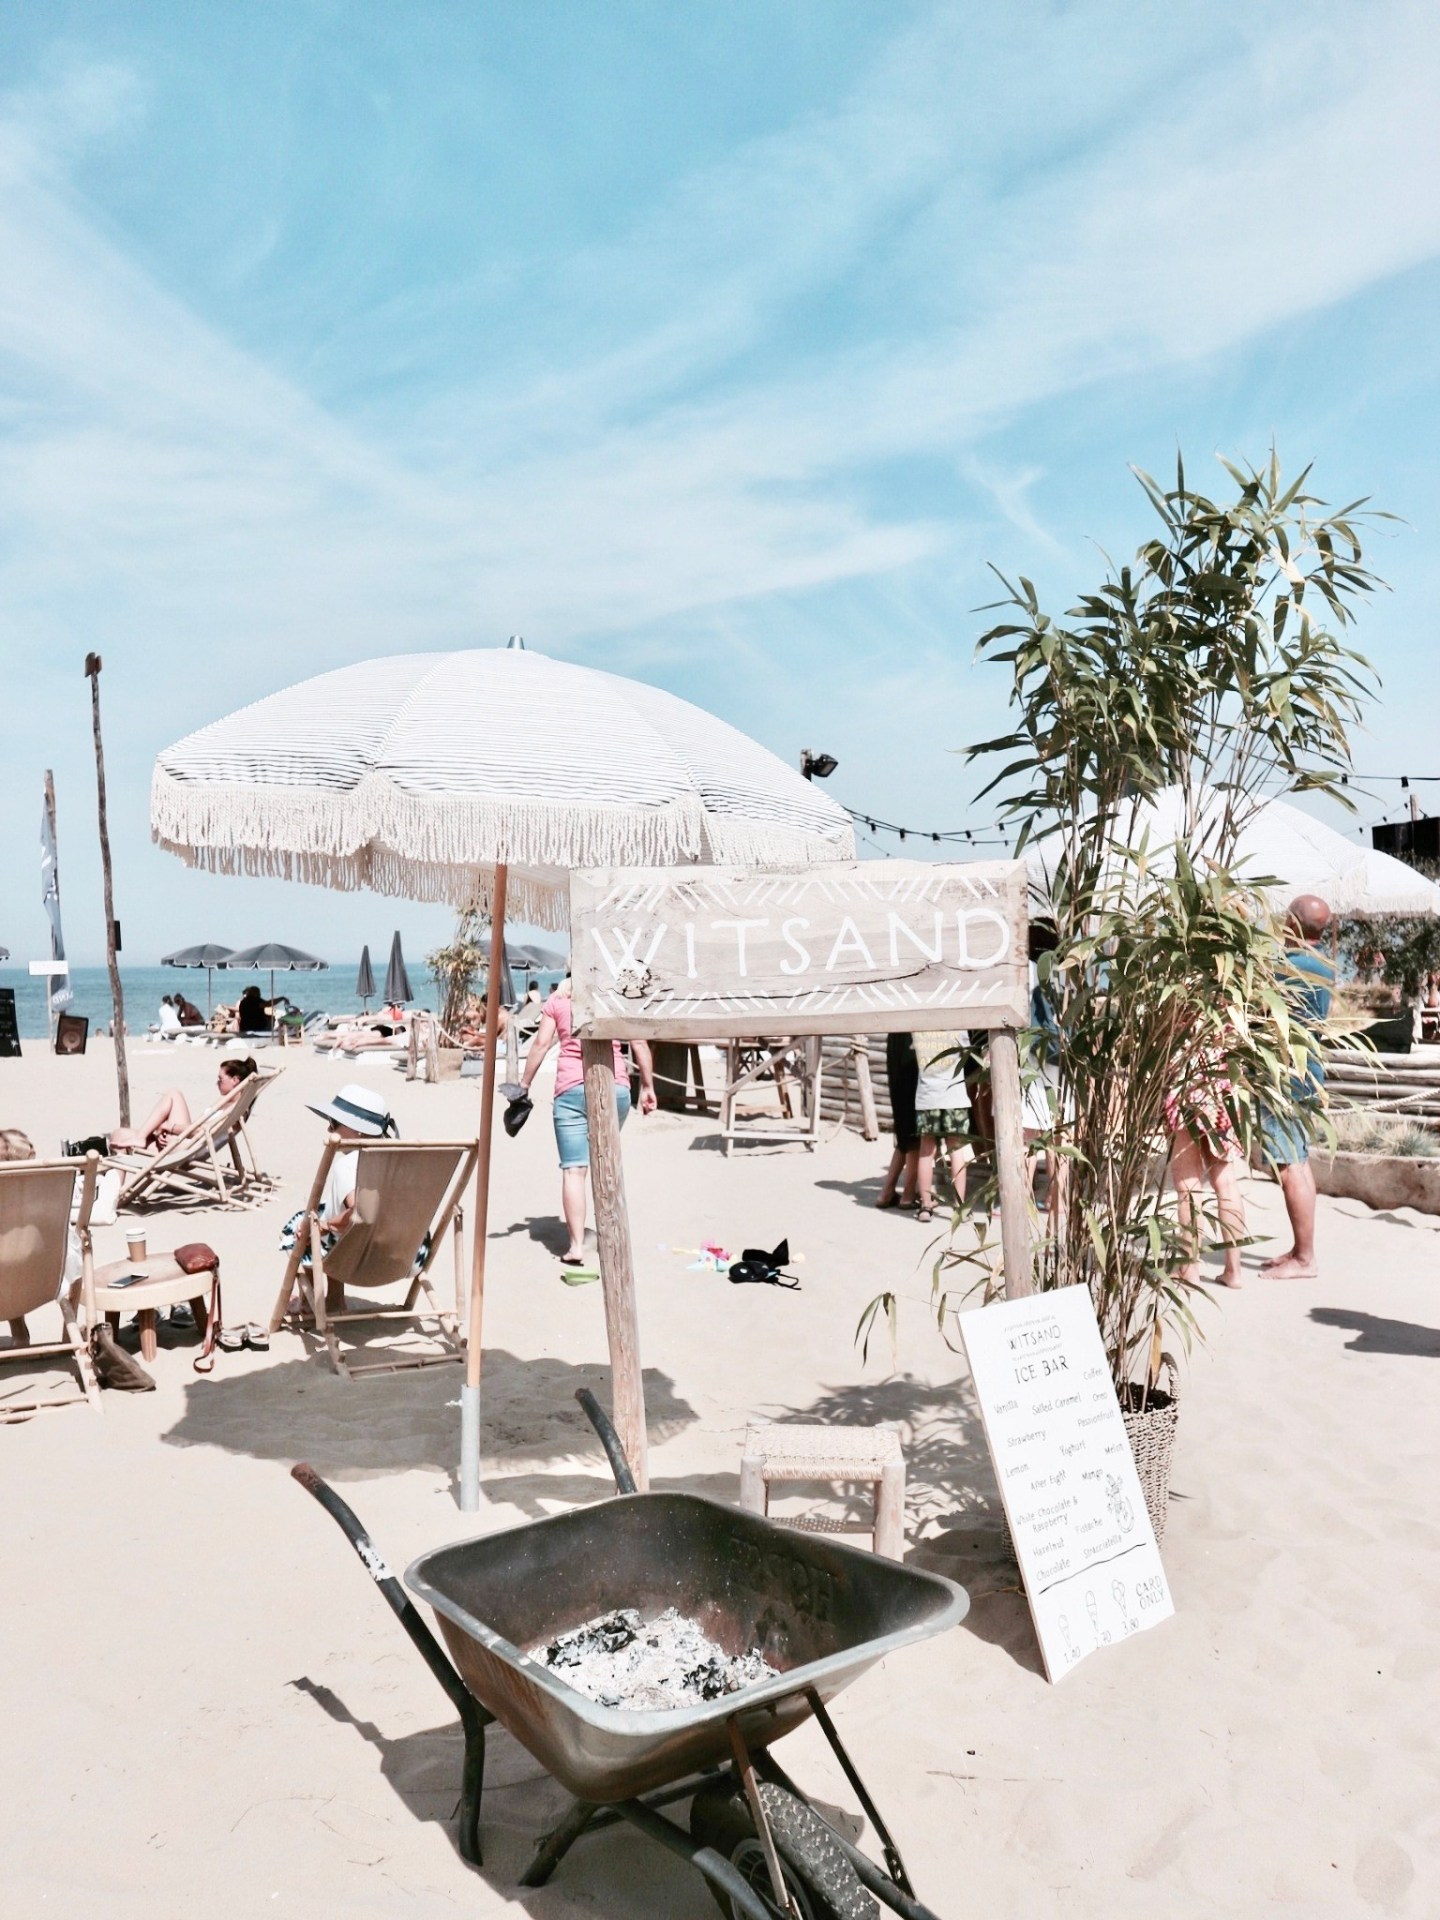 Love Those Endless Sunny Beach Days | Strandclub Witsand, Noordwijk